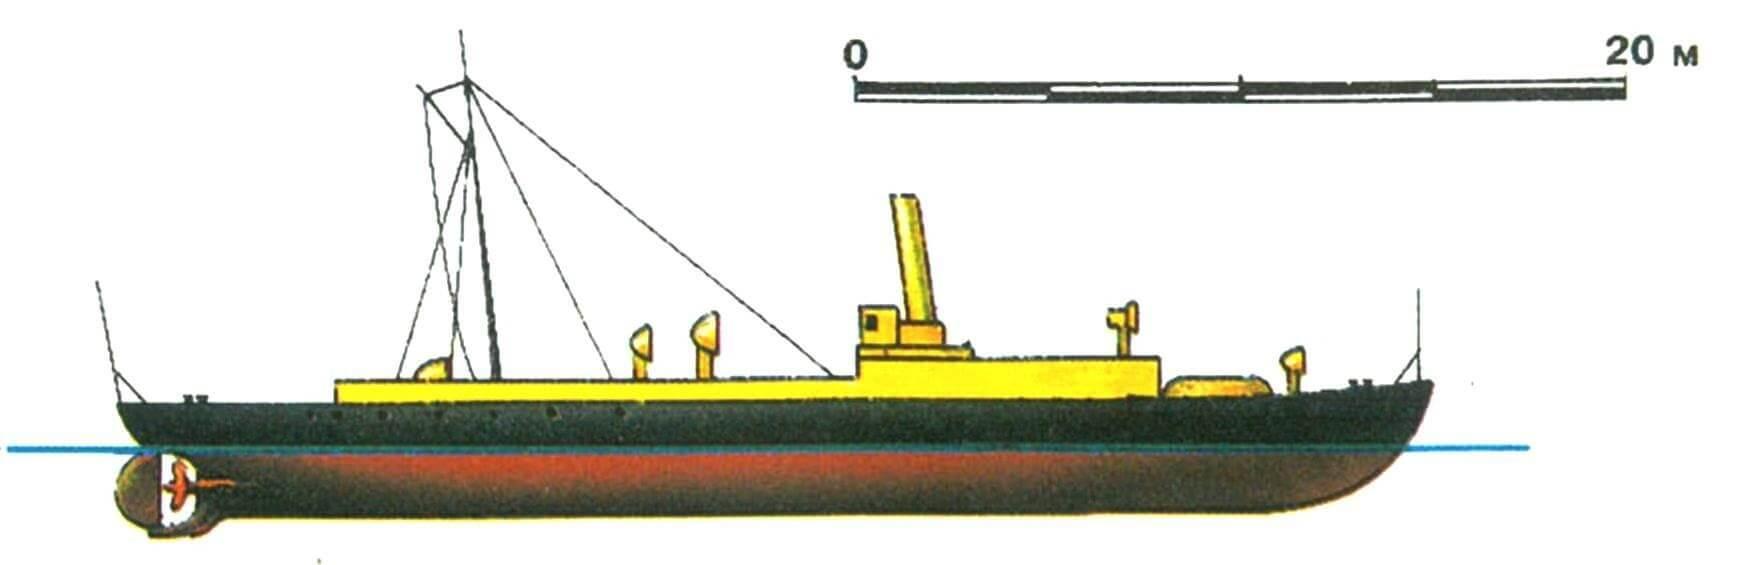 25. Миноносец «Ягер», Германия, 1883 г.